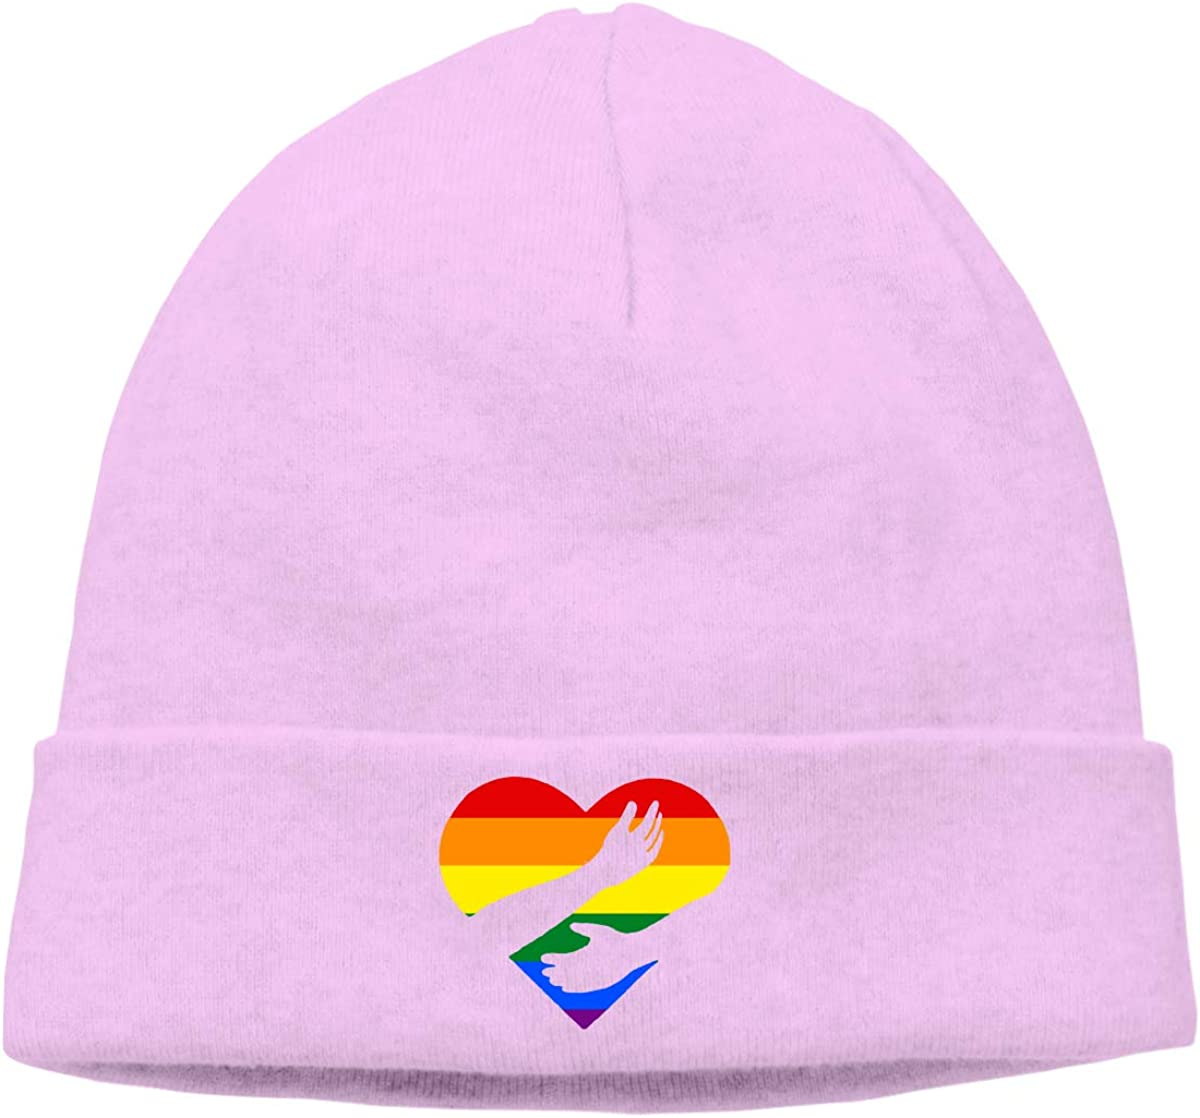 Unisex Knitted Hat Skull Hat Beanie Cap Hug Flag of LGBT Pride Rainbow Flag